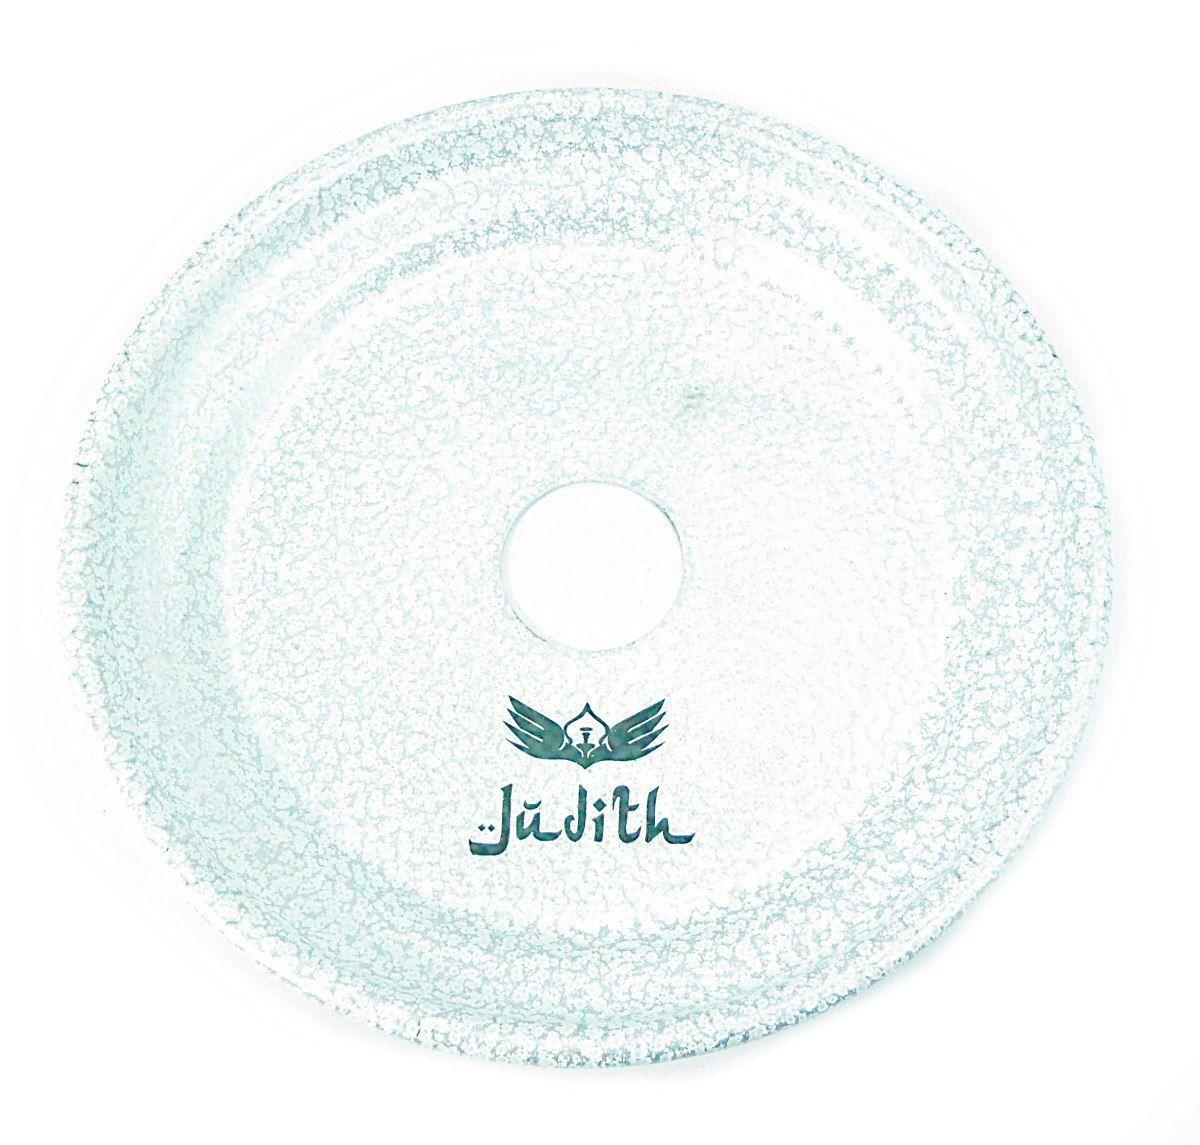 Prato para narguile marca Judith, GRANDE, em alumínio. 17cm de diâmetro. Branco